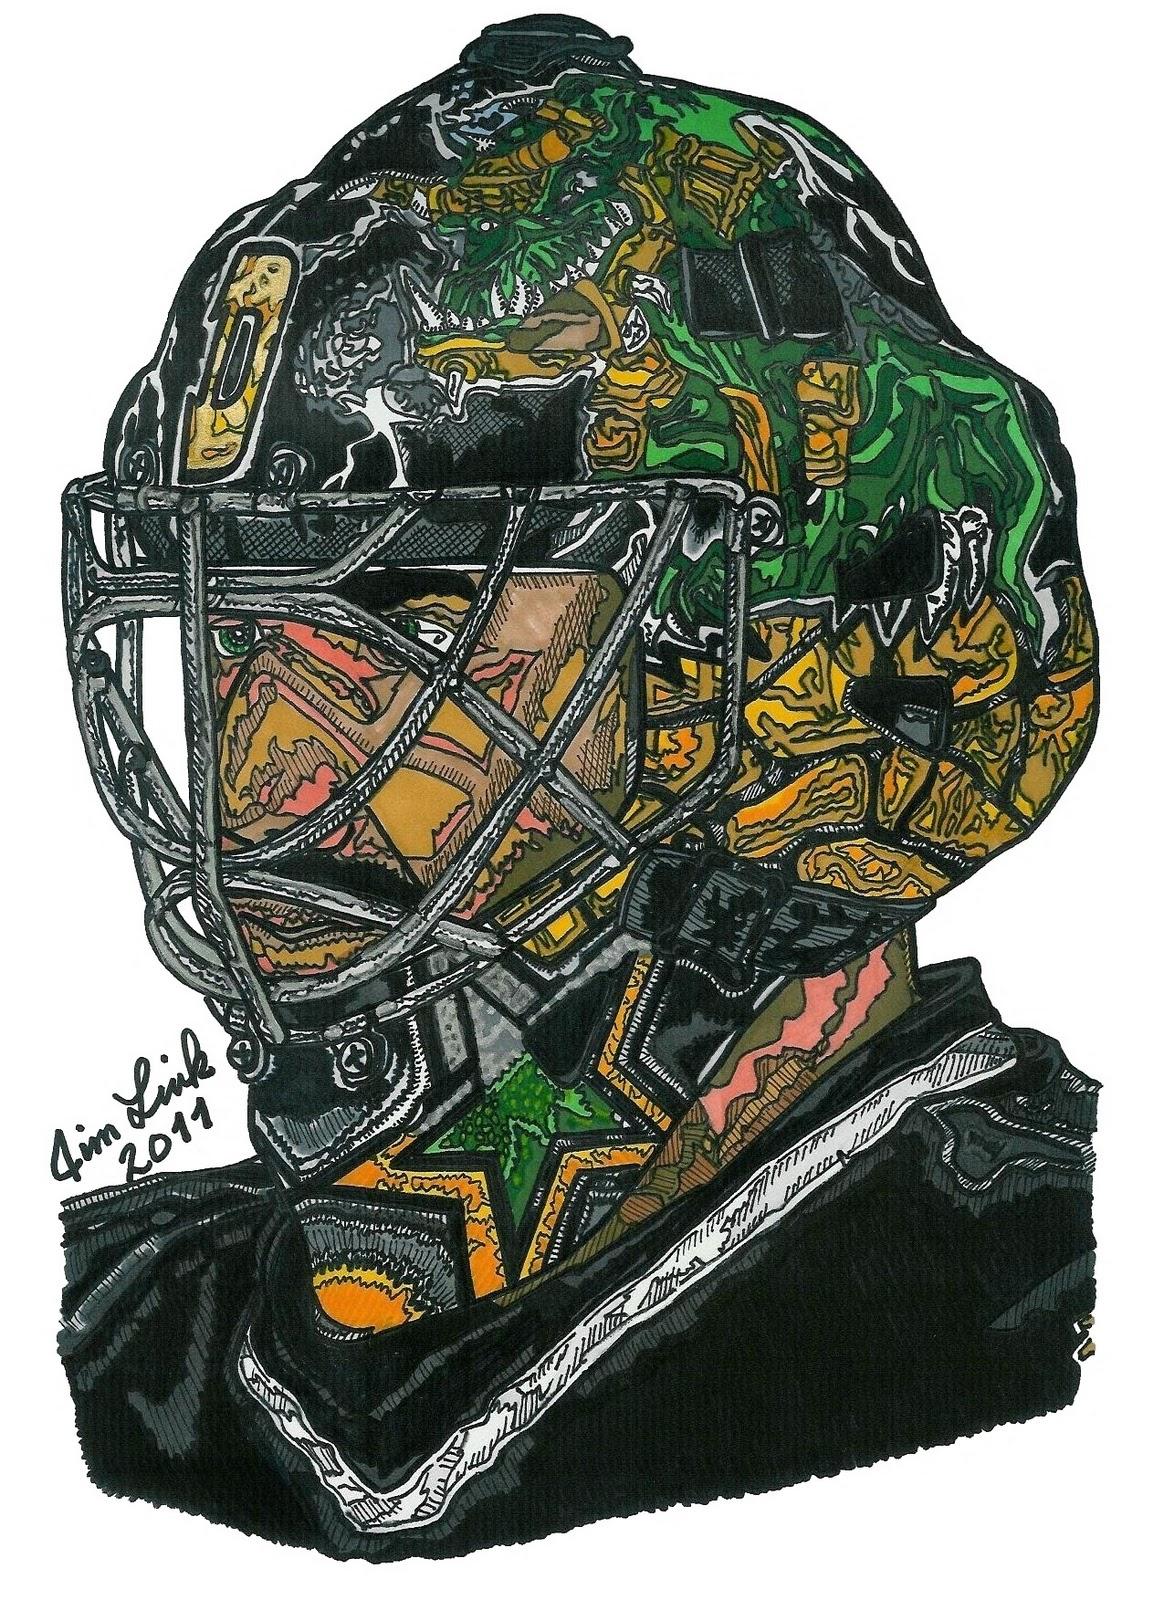 Marty Turco's 2009-2010 Dallas Stars Mask - The Goalie ...  |Marty Turco Mask